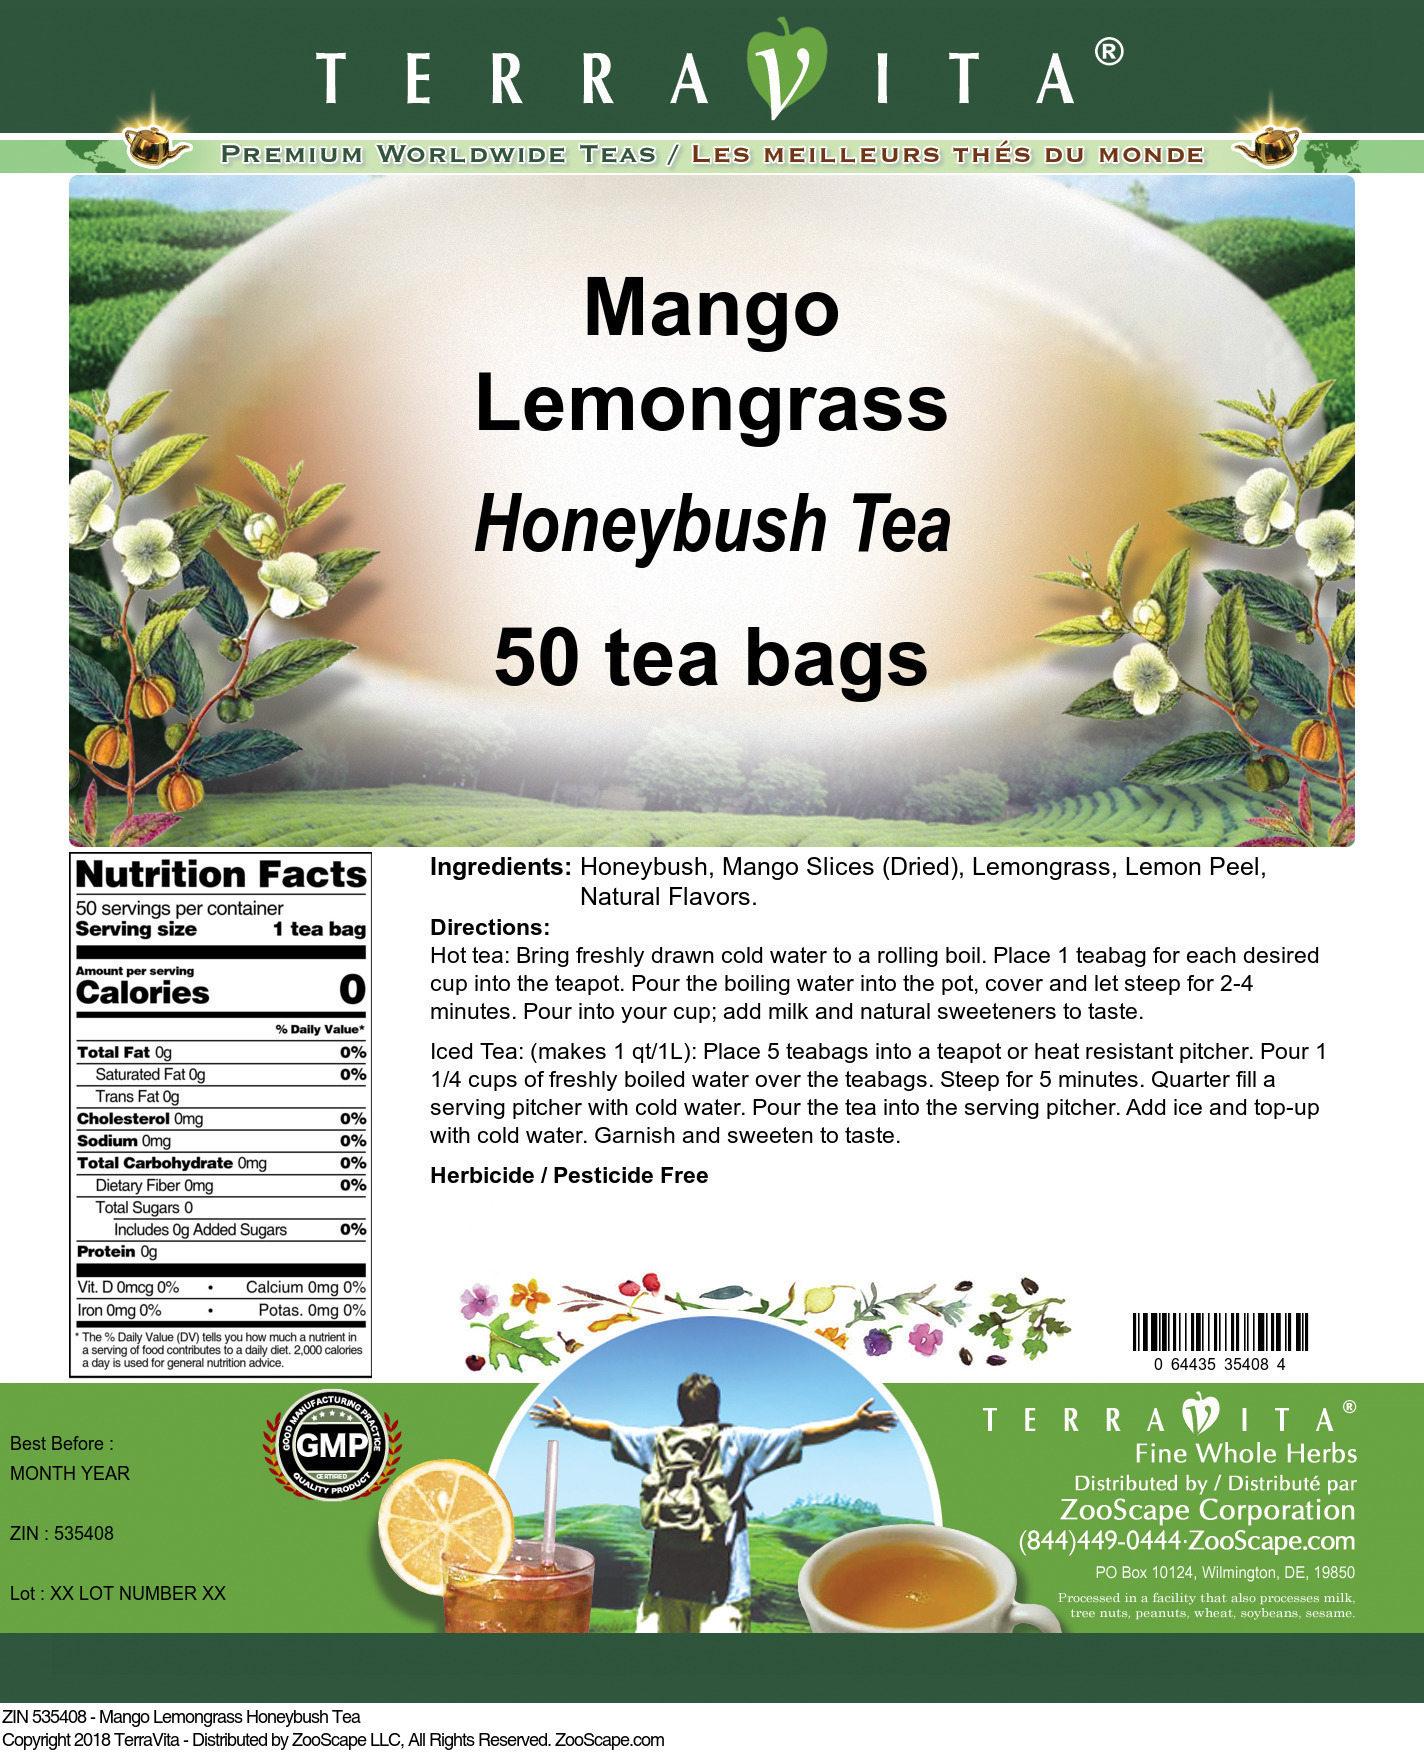 Mango Lemongrass Honeybush Tea